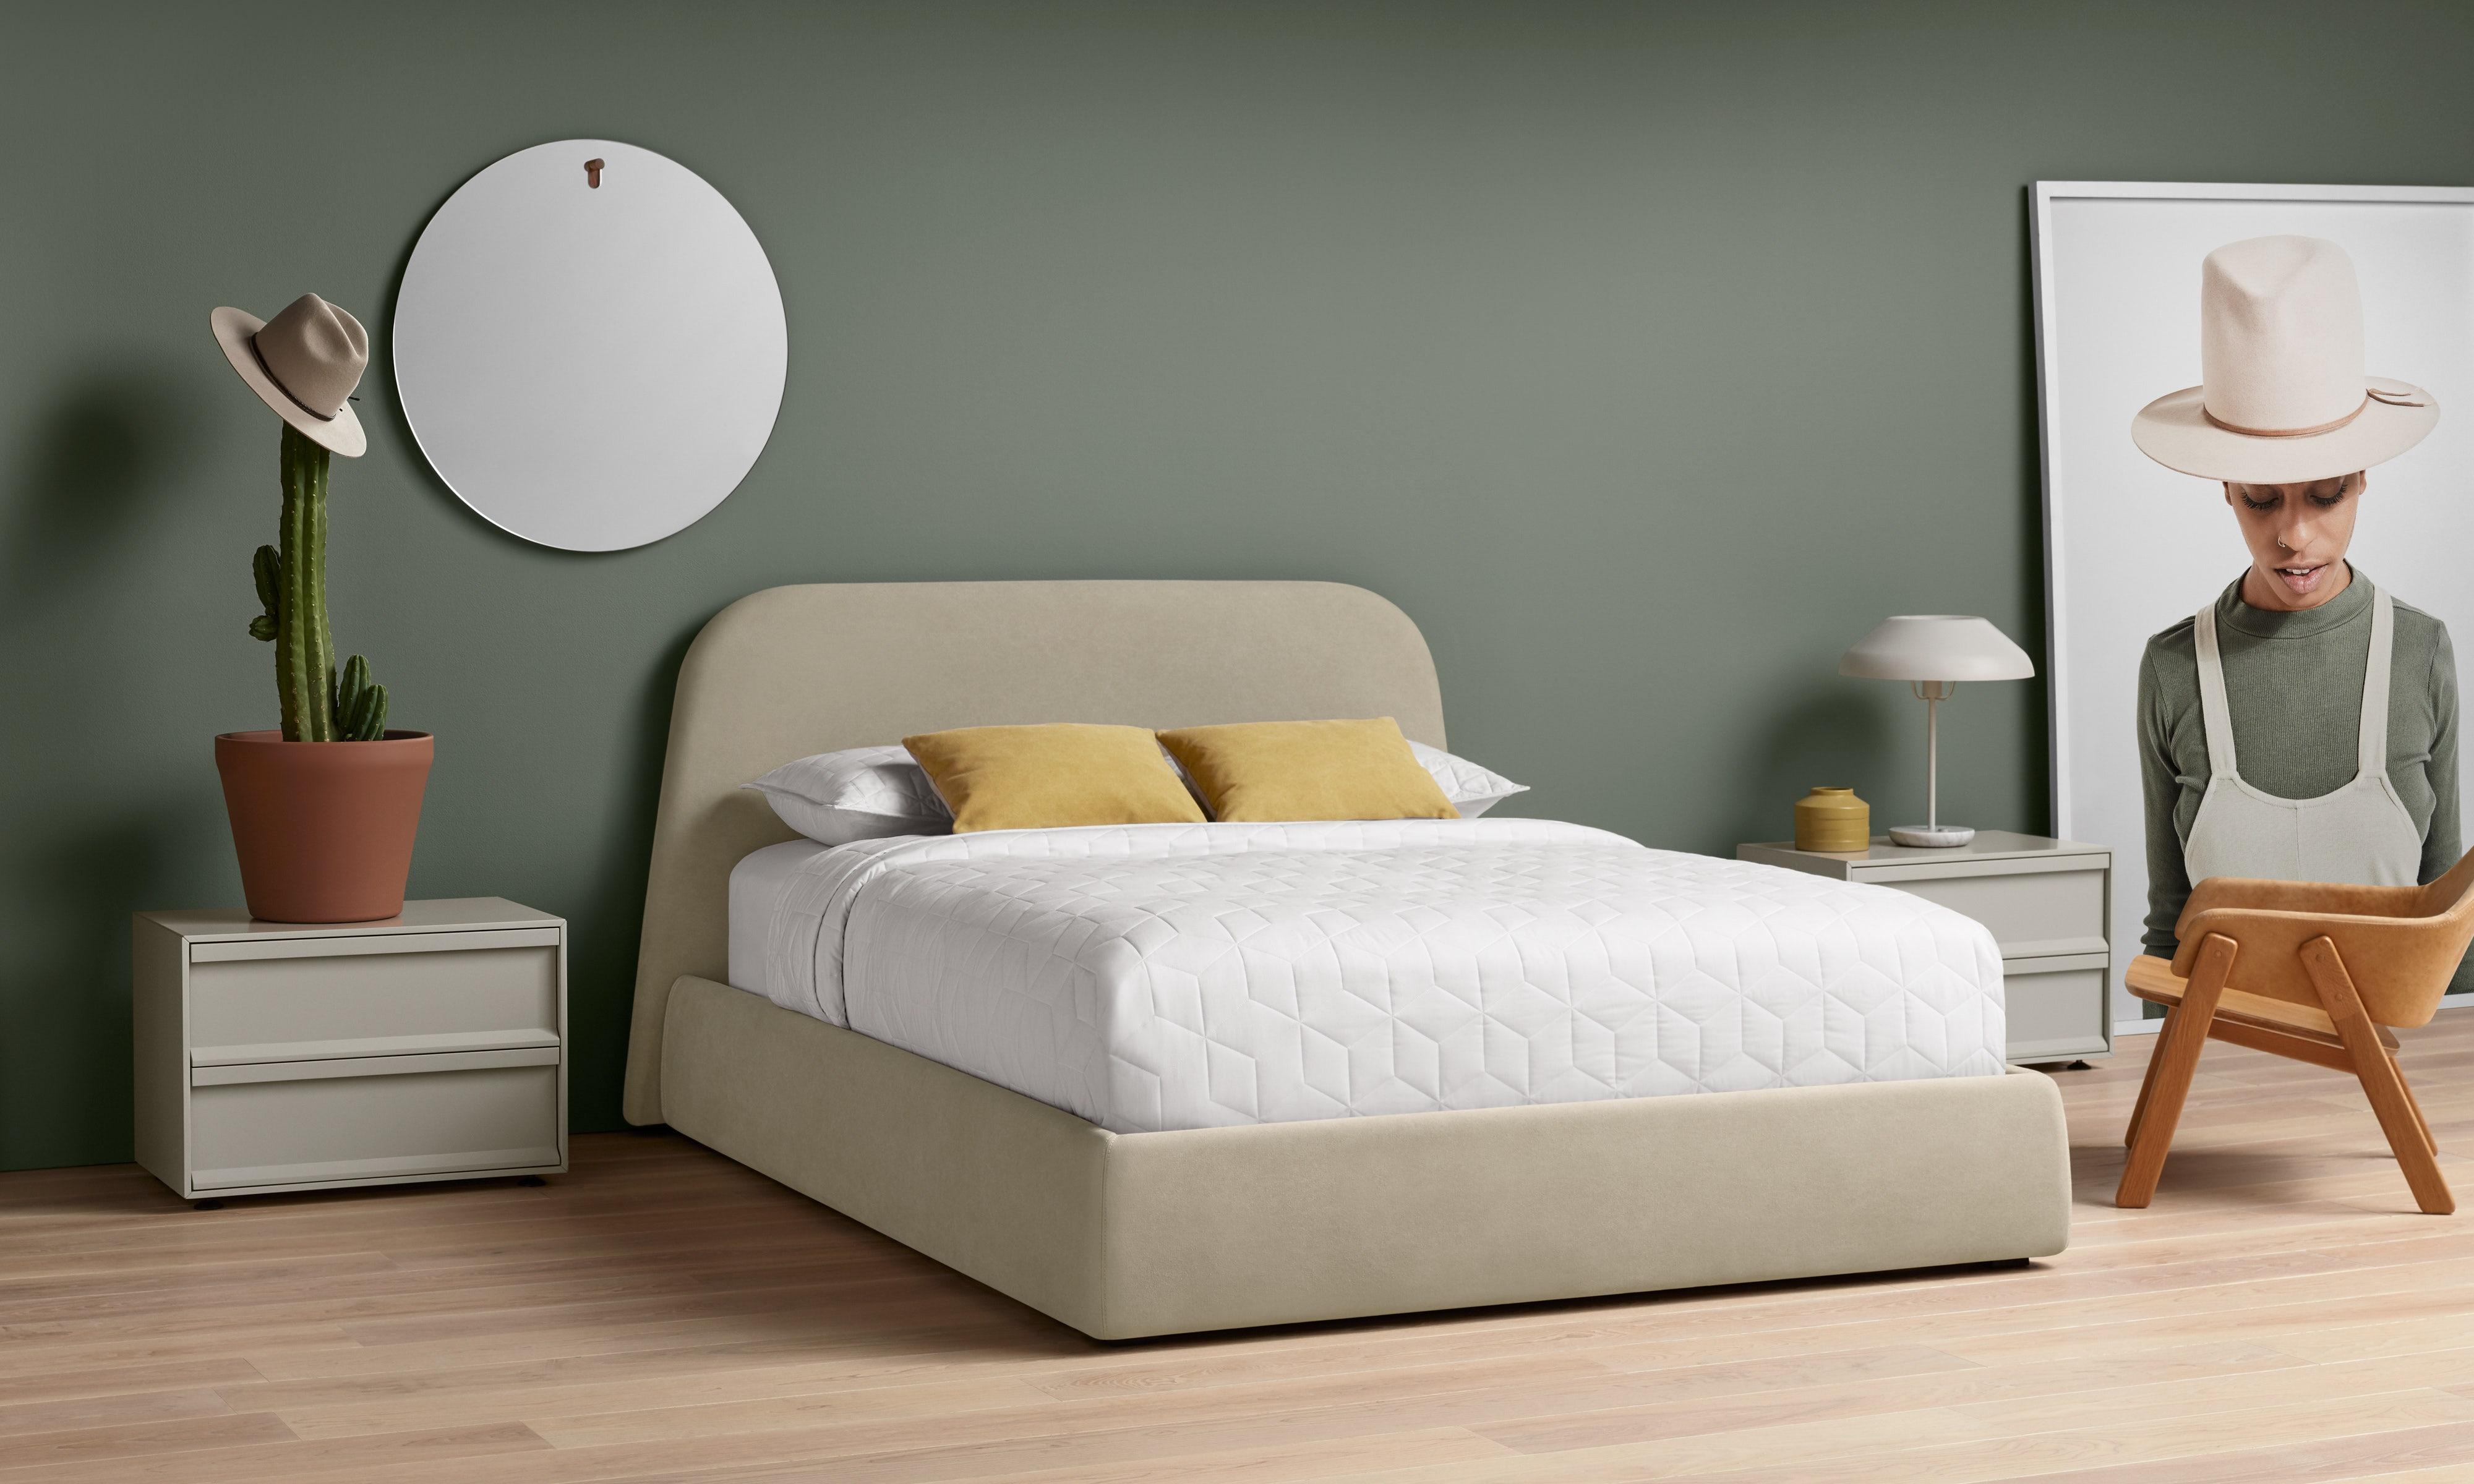 Lid Bed